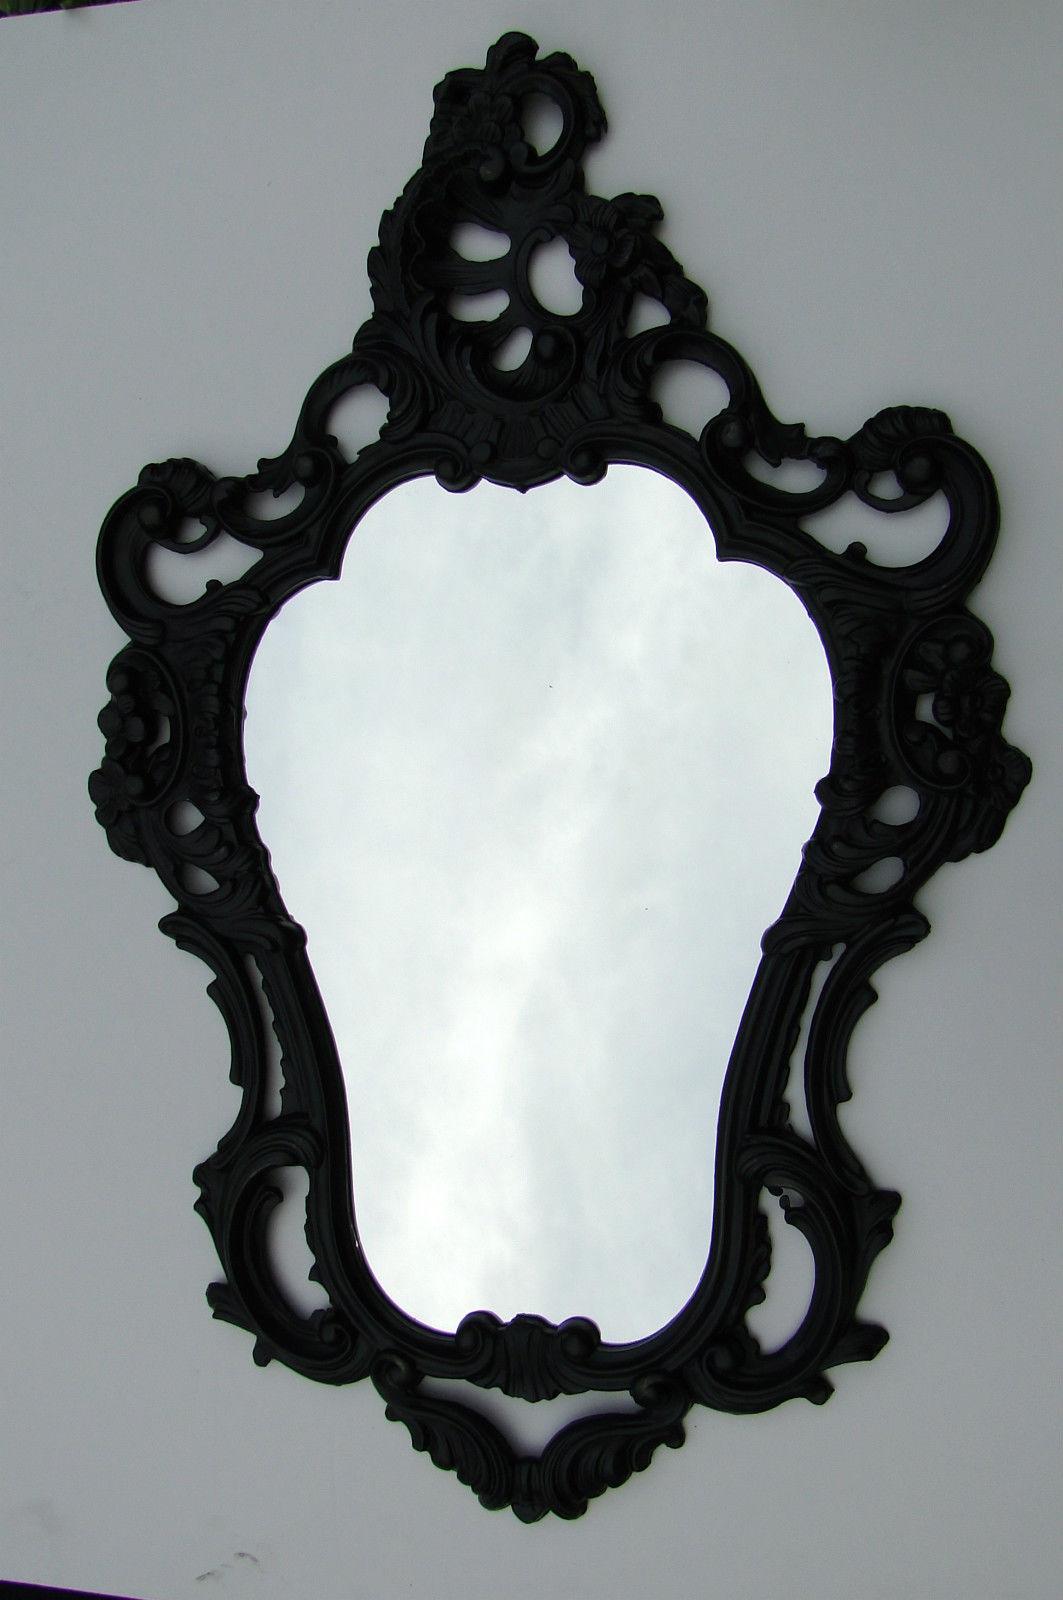 wandspiegel schwarz barock spiegel oval 50x76 antik bad. Black Bedroom Furniture Sets. Home Design Ideas